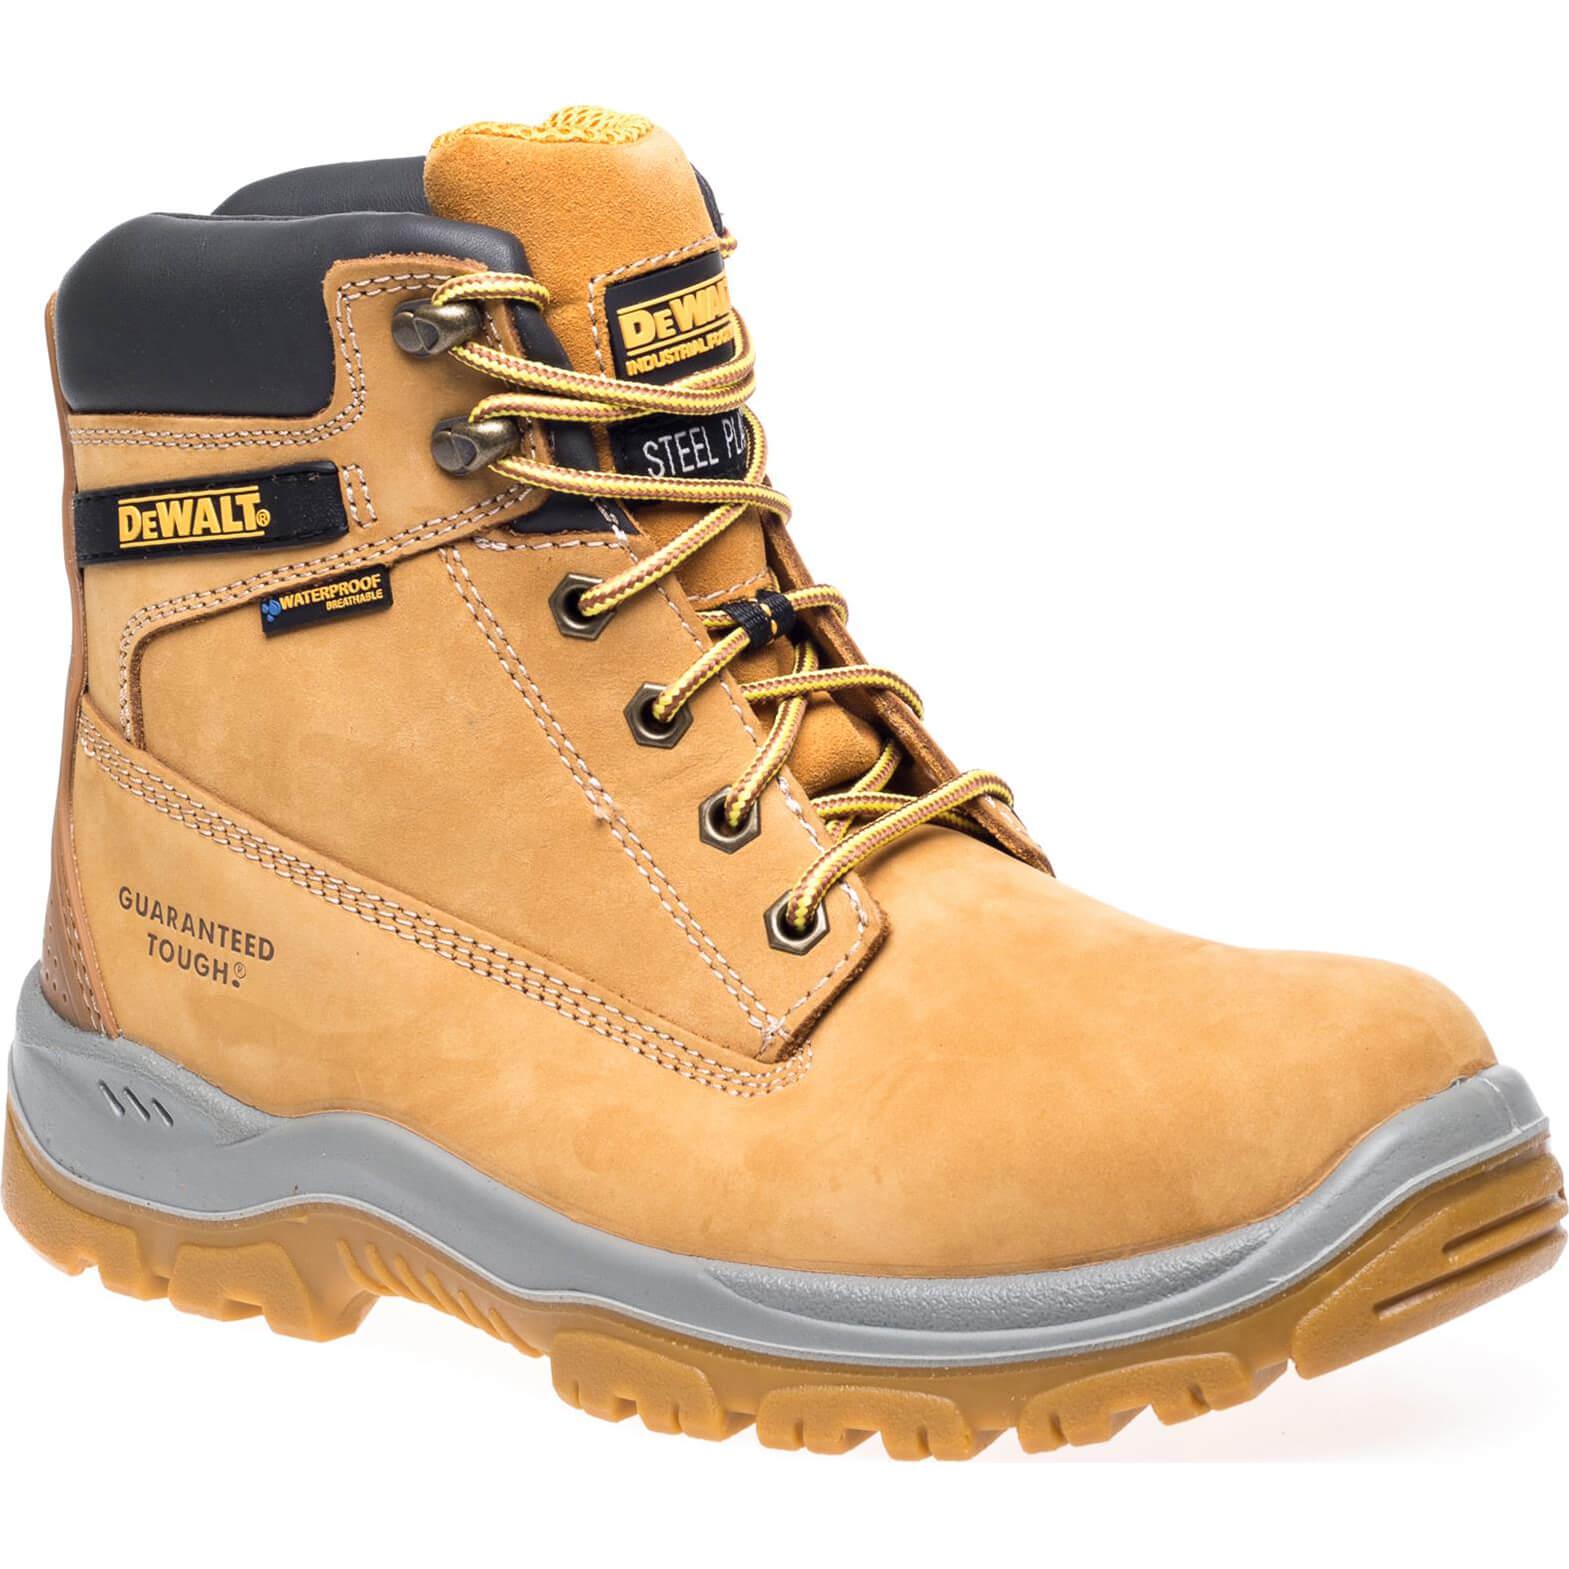 DeWalt Mens Titanium S3 Safety Boots Honey Size 11